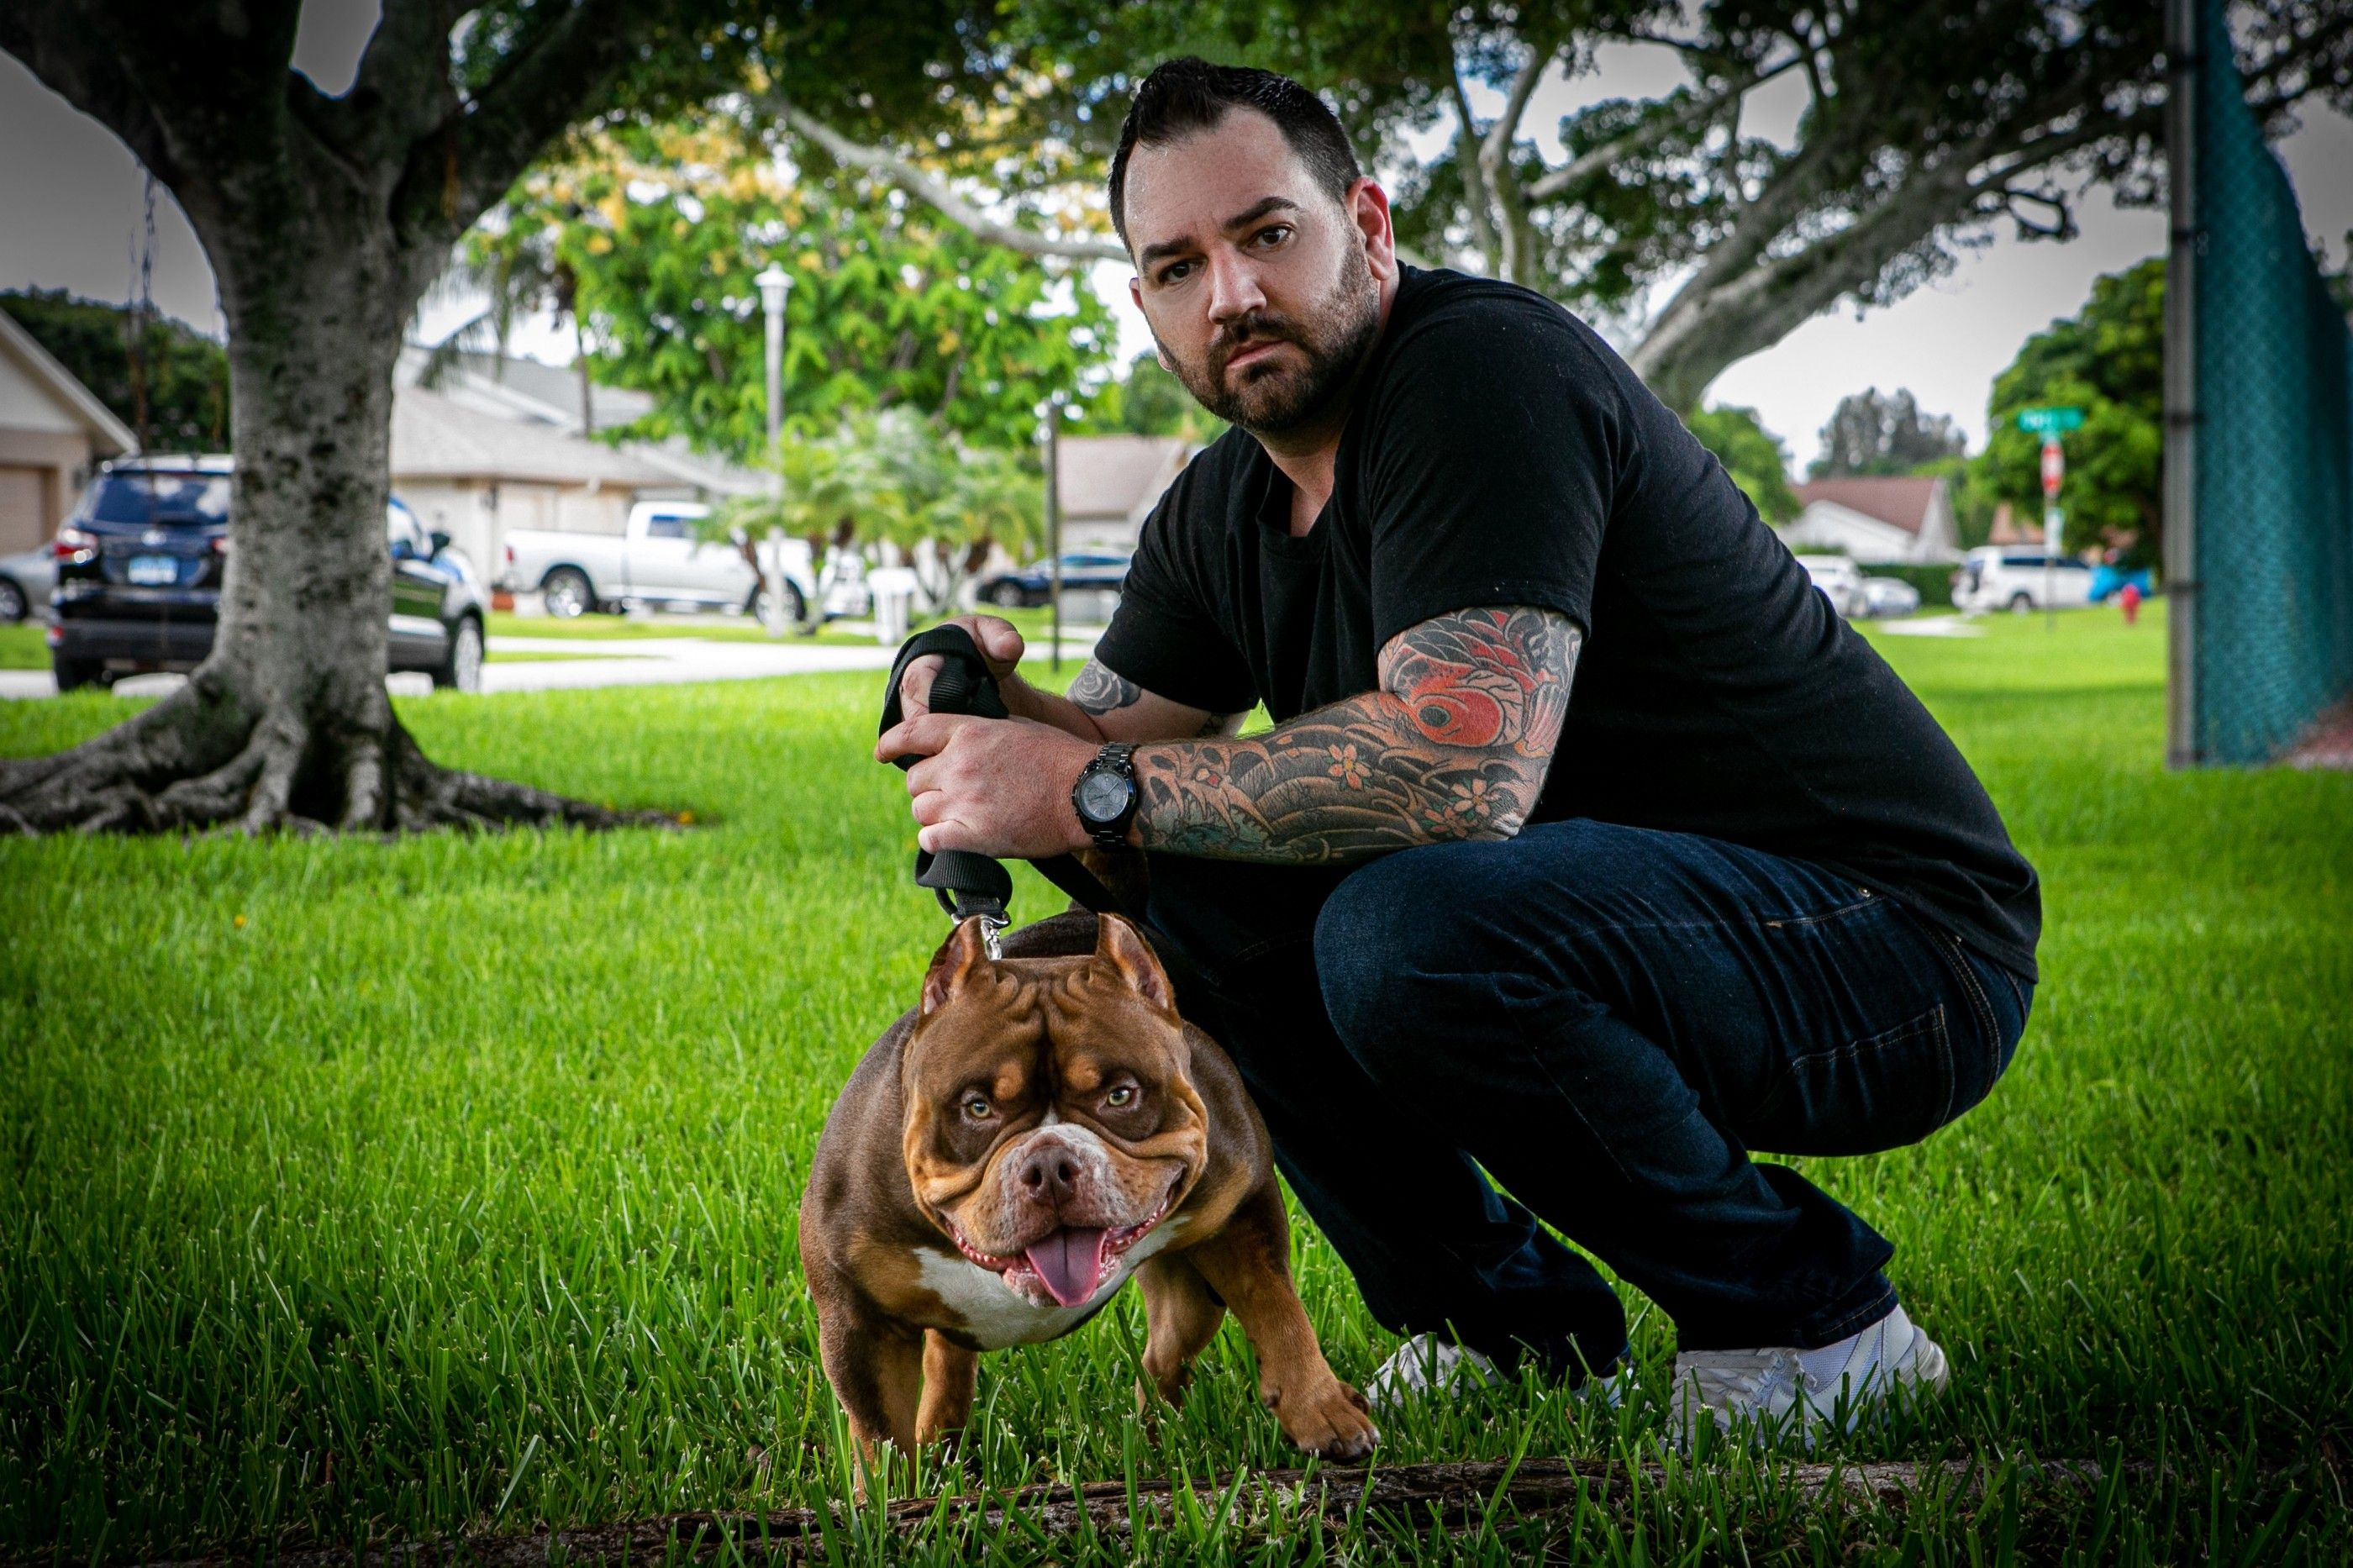 The Extreme Pocket Bully Puppies Of Venomline American Bully Breeders In 2020 American Bully Bully Breeds Pocket Bully